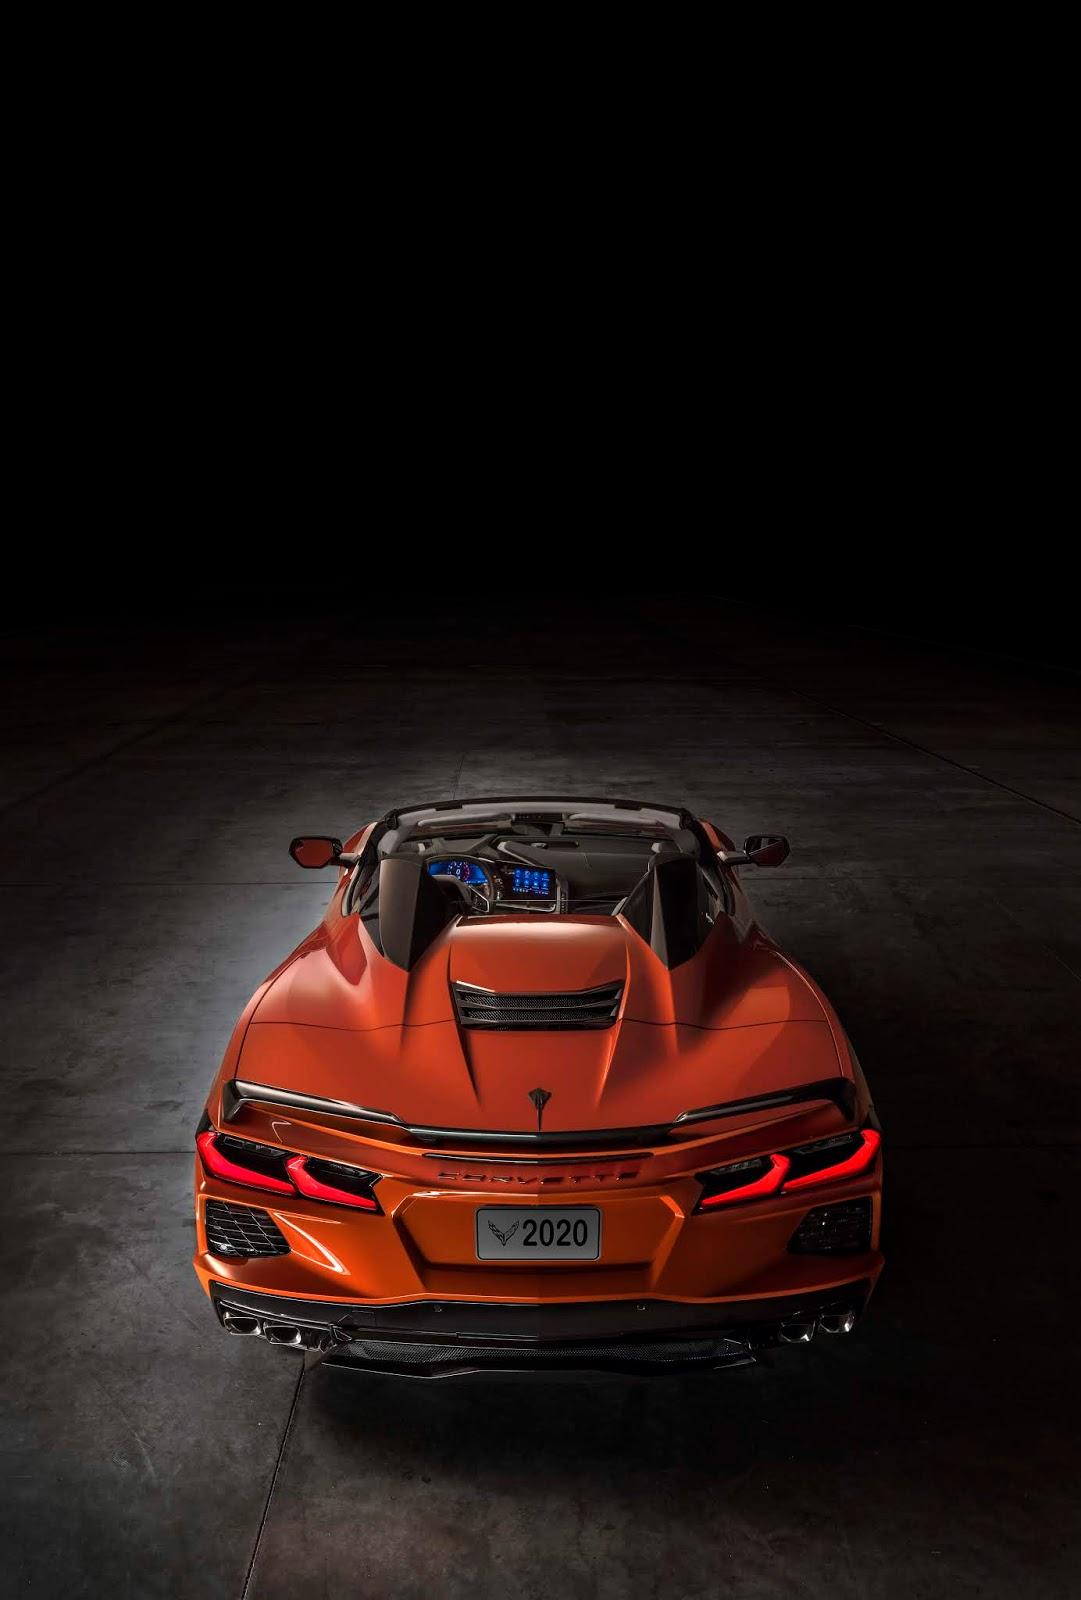 2020 Chevrolet Corvette Stingray Convertible 013 Γιατί η C8 Convertible είναι η καλύτερη Corvette ever C8, Chevrolet, Chevrolet Corvette, Corvette, zblog, ειδήσεις, καινούργιο, καινούρια, καινούριο